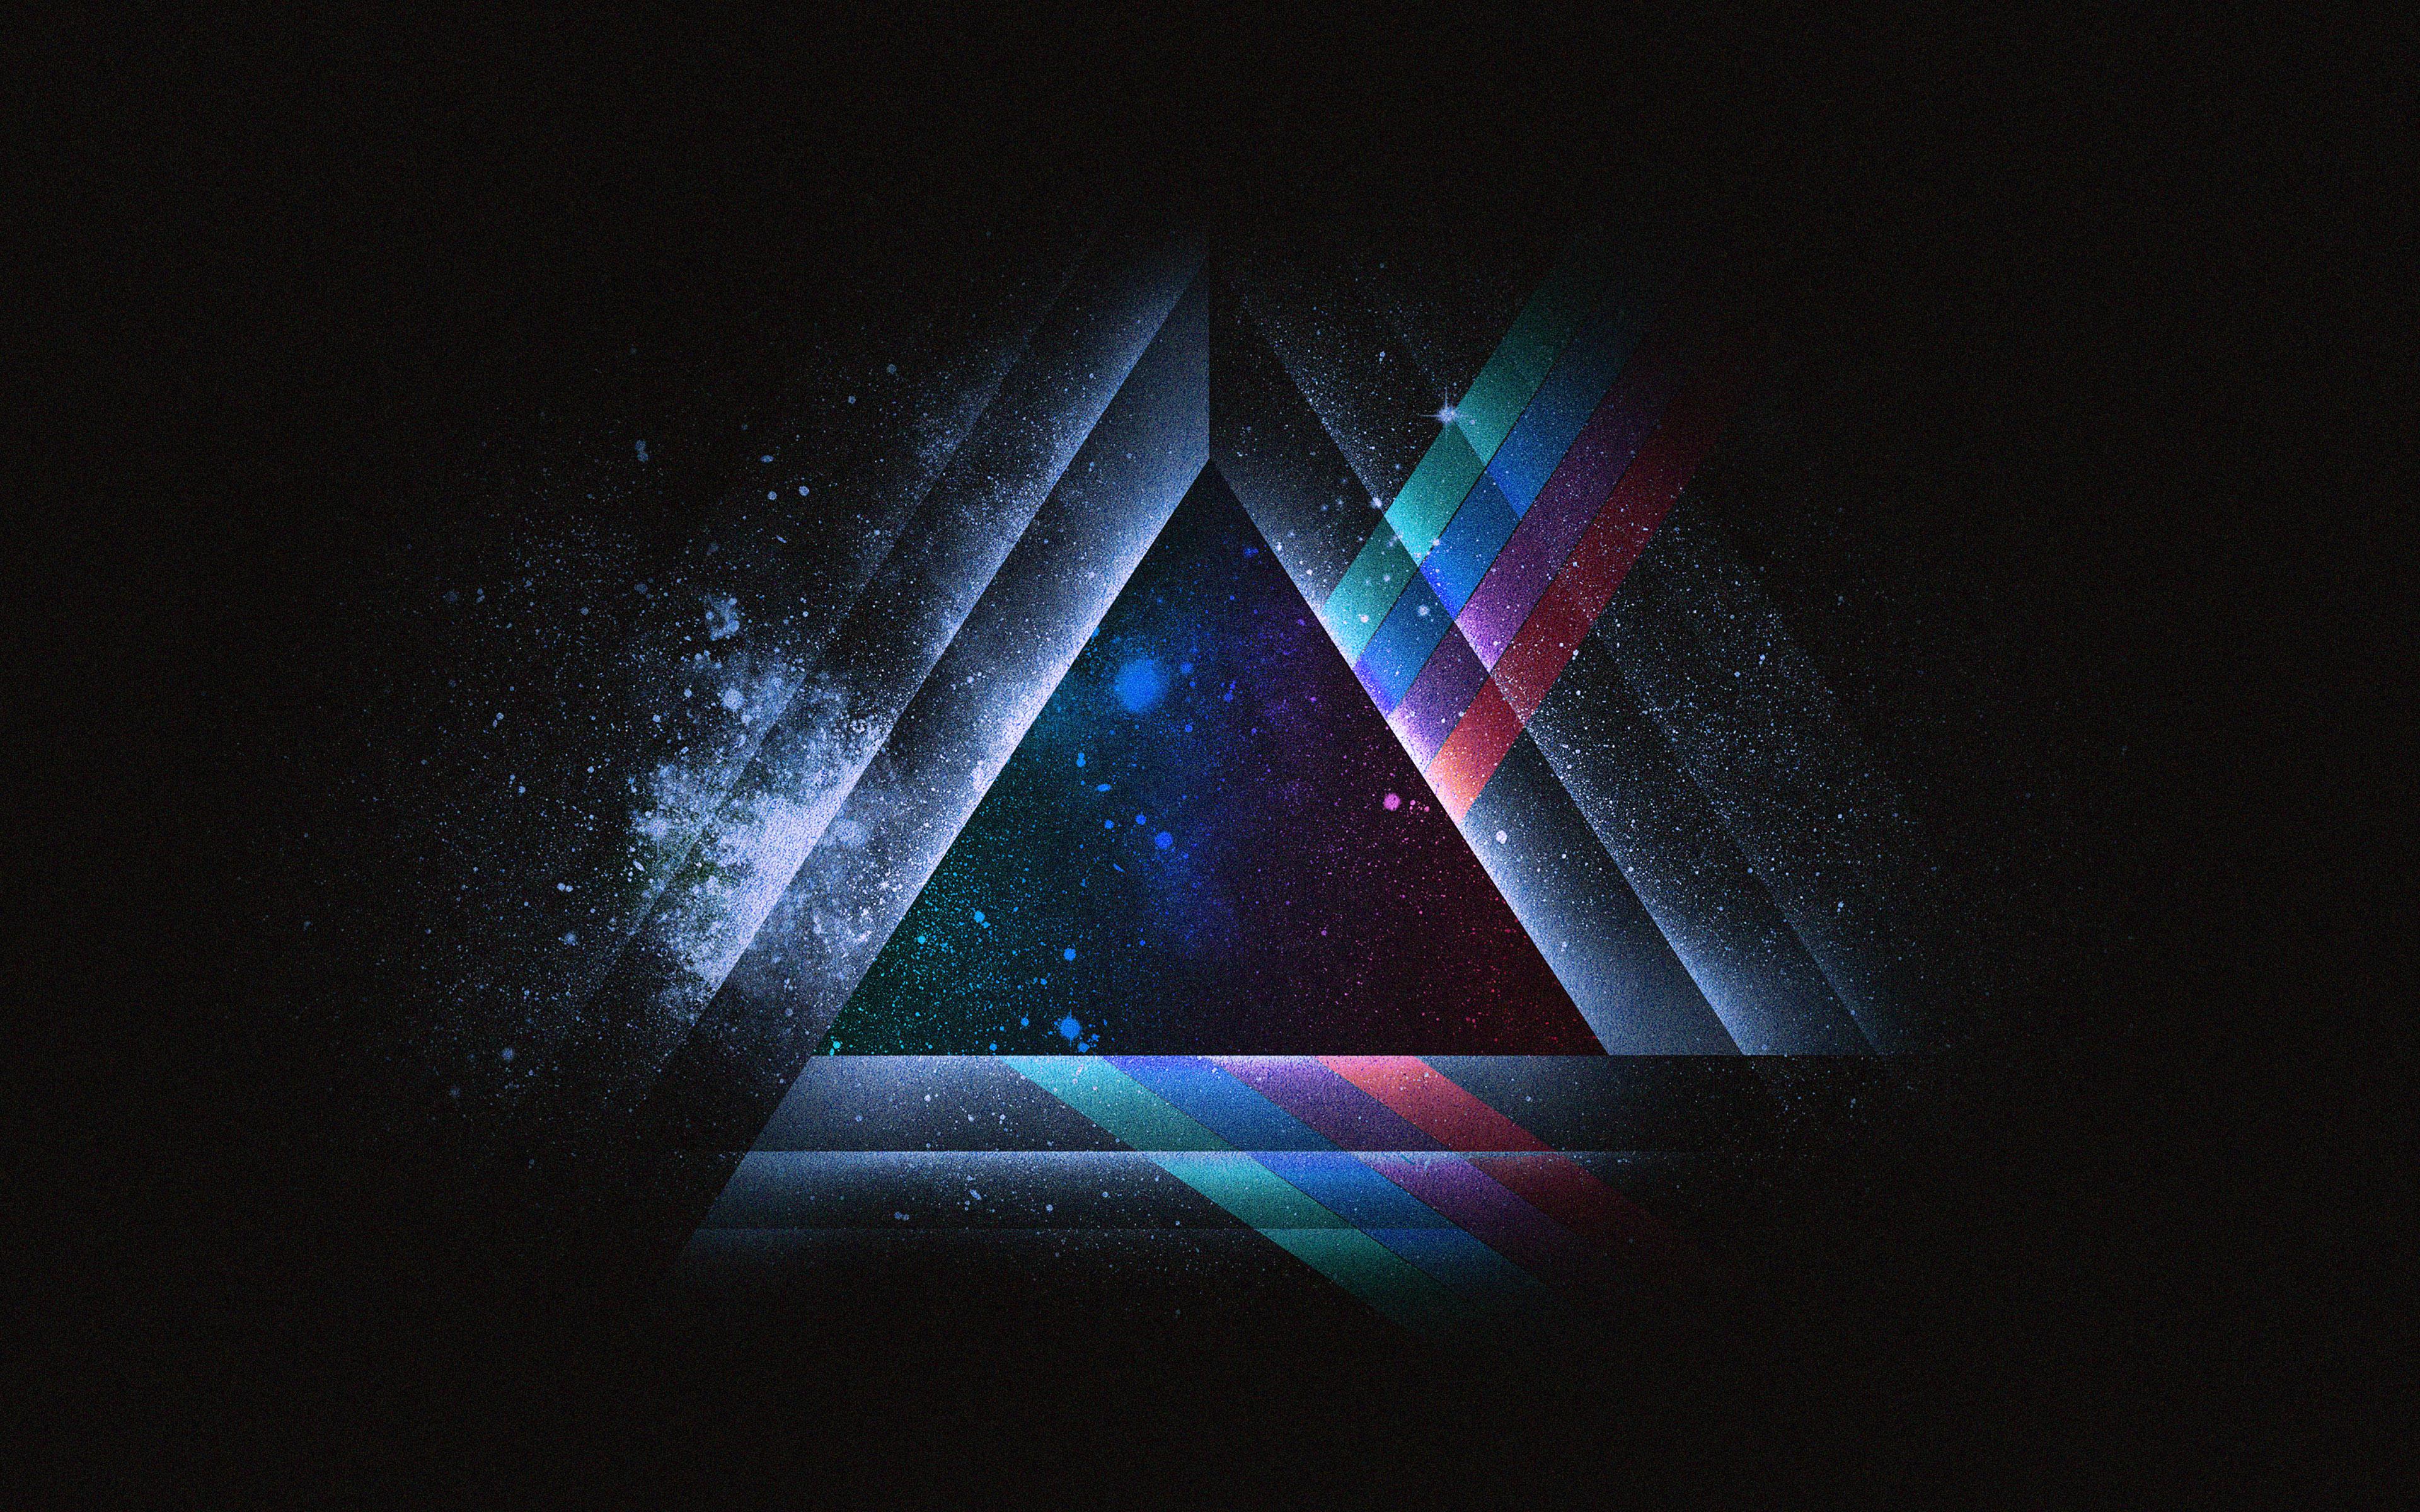 ac08-wallpaper-triangle-art-blue-rainbow-illust-graphic